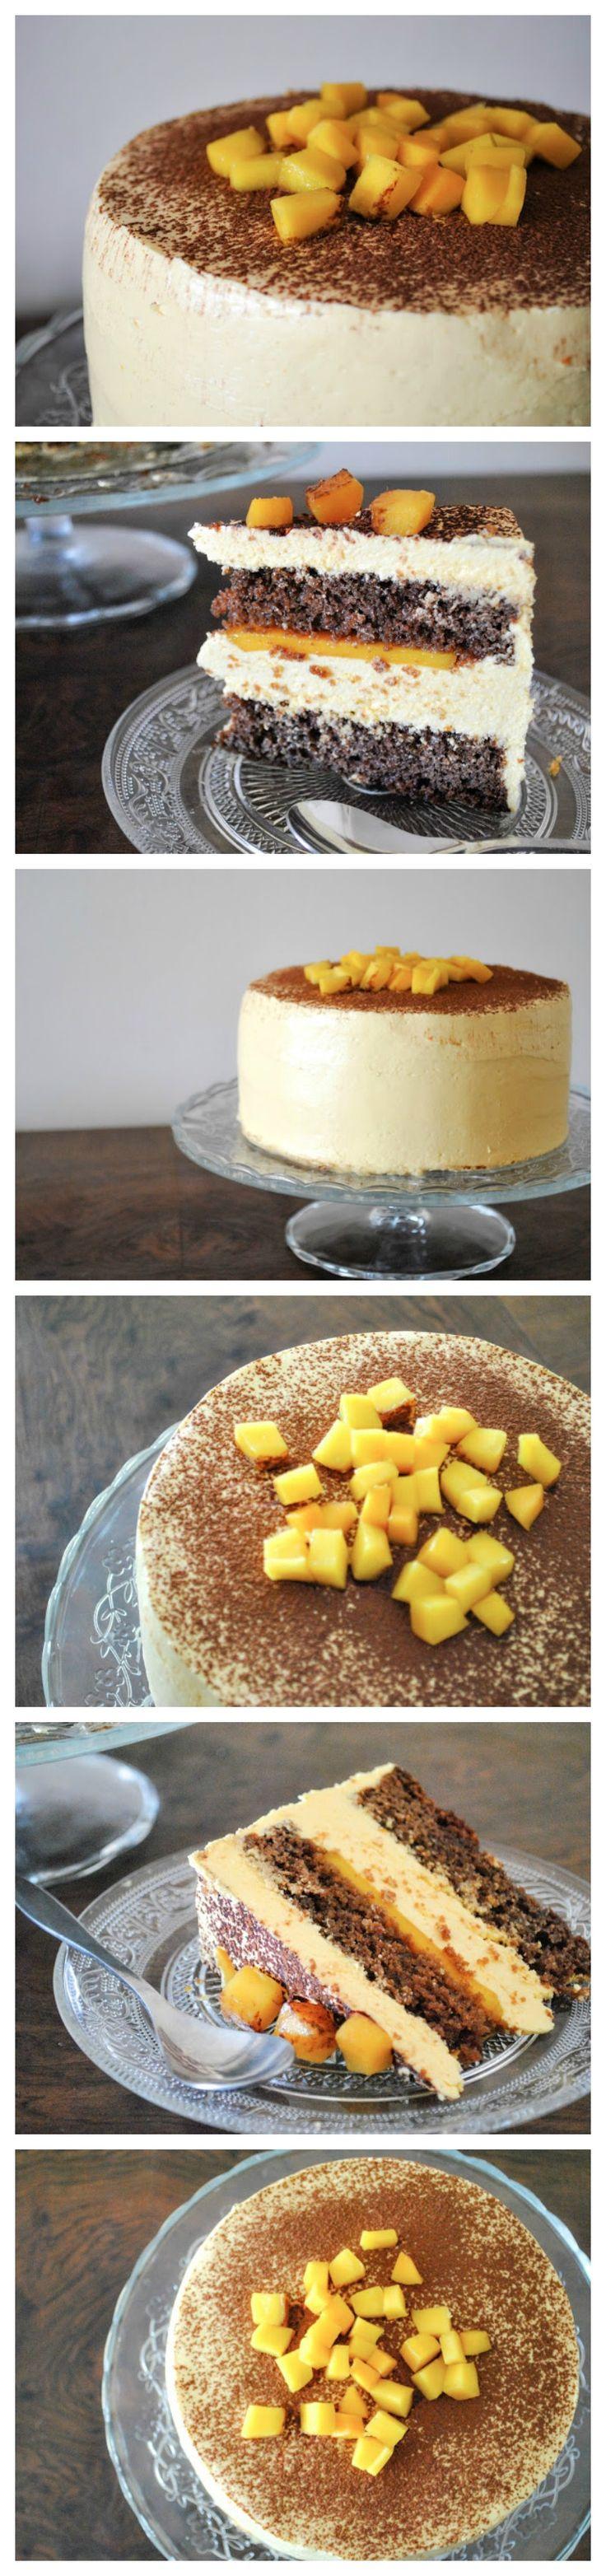 tarta-layer-chocolate-amaretto-mango-pecados-reposteria.jpg (800×3400)